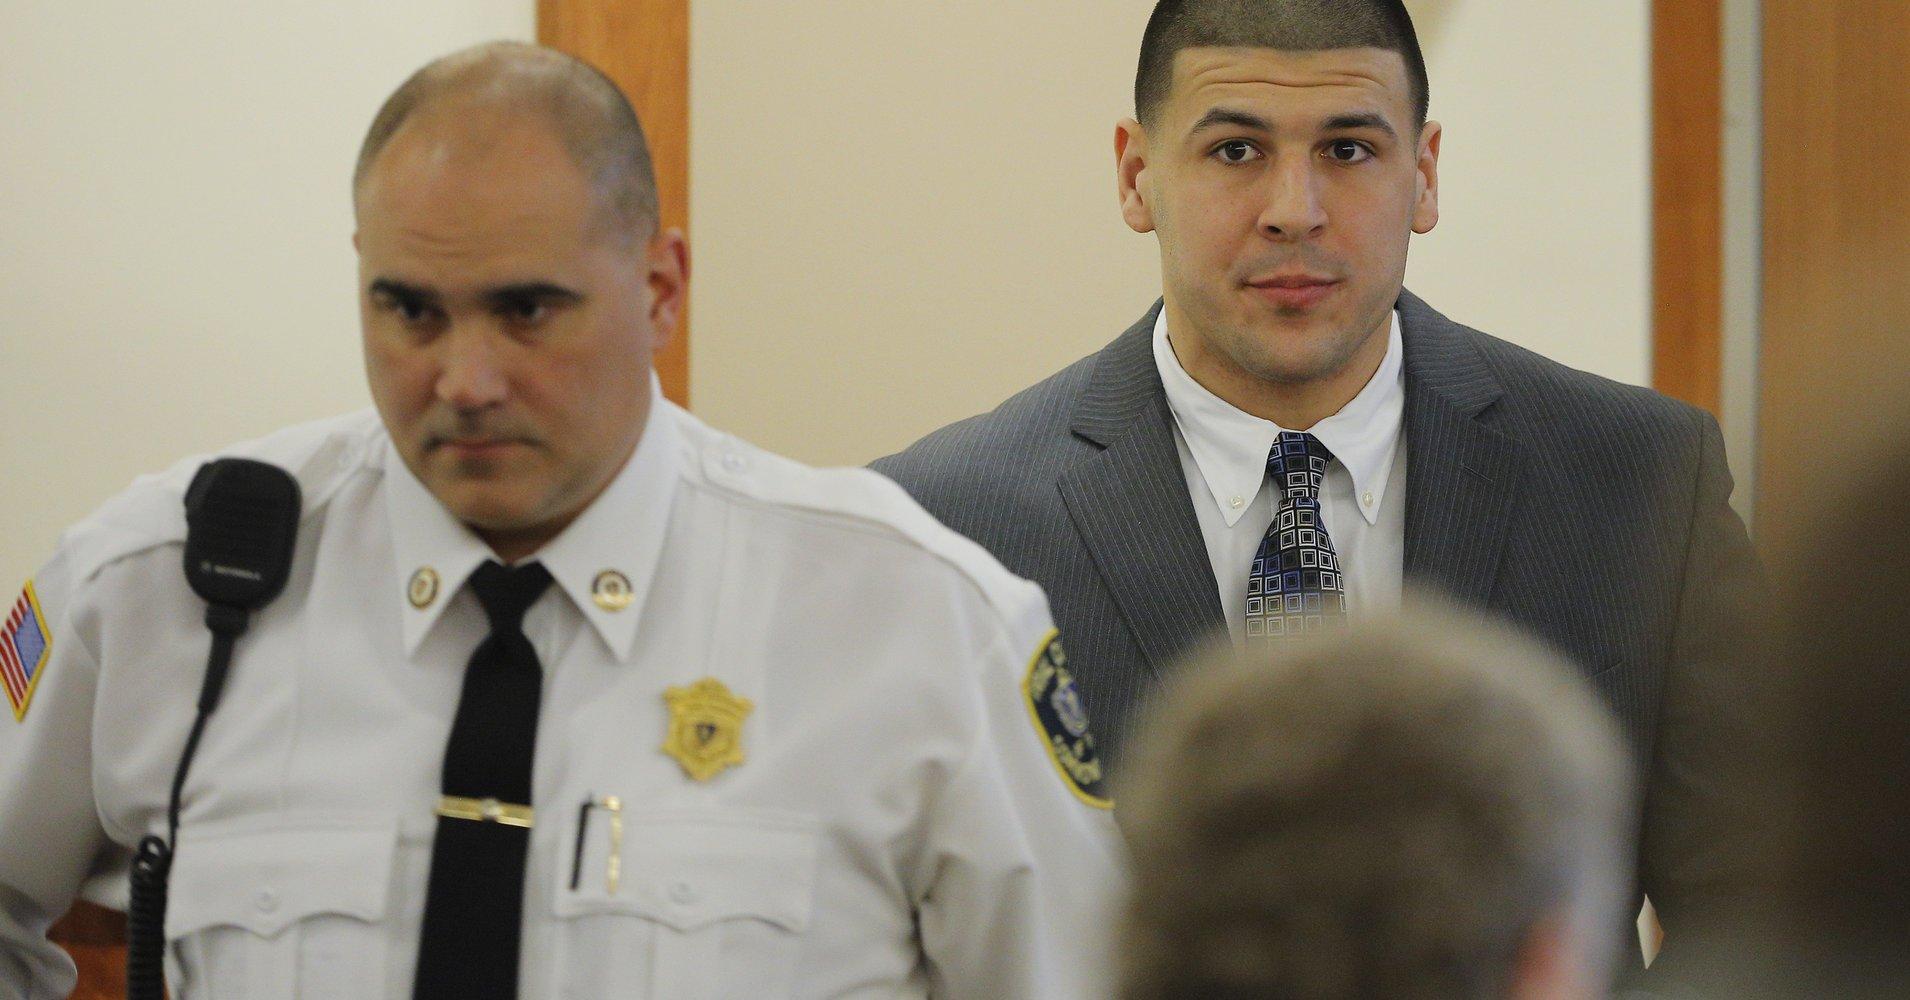 Aaron Hernandez had CTE, lawyer says https://t.co/1WCvkOhYwA https://t.co/PFdtoKH415